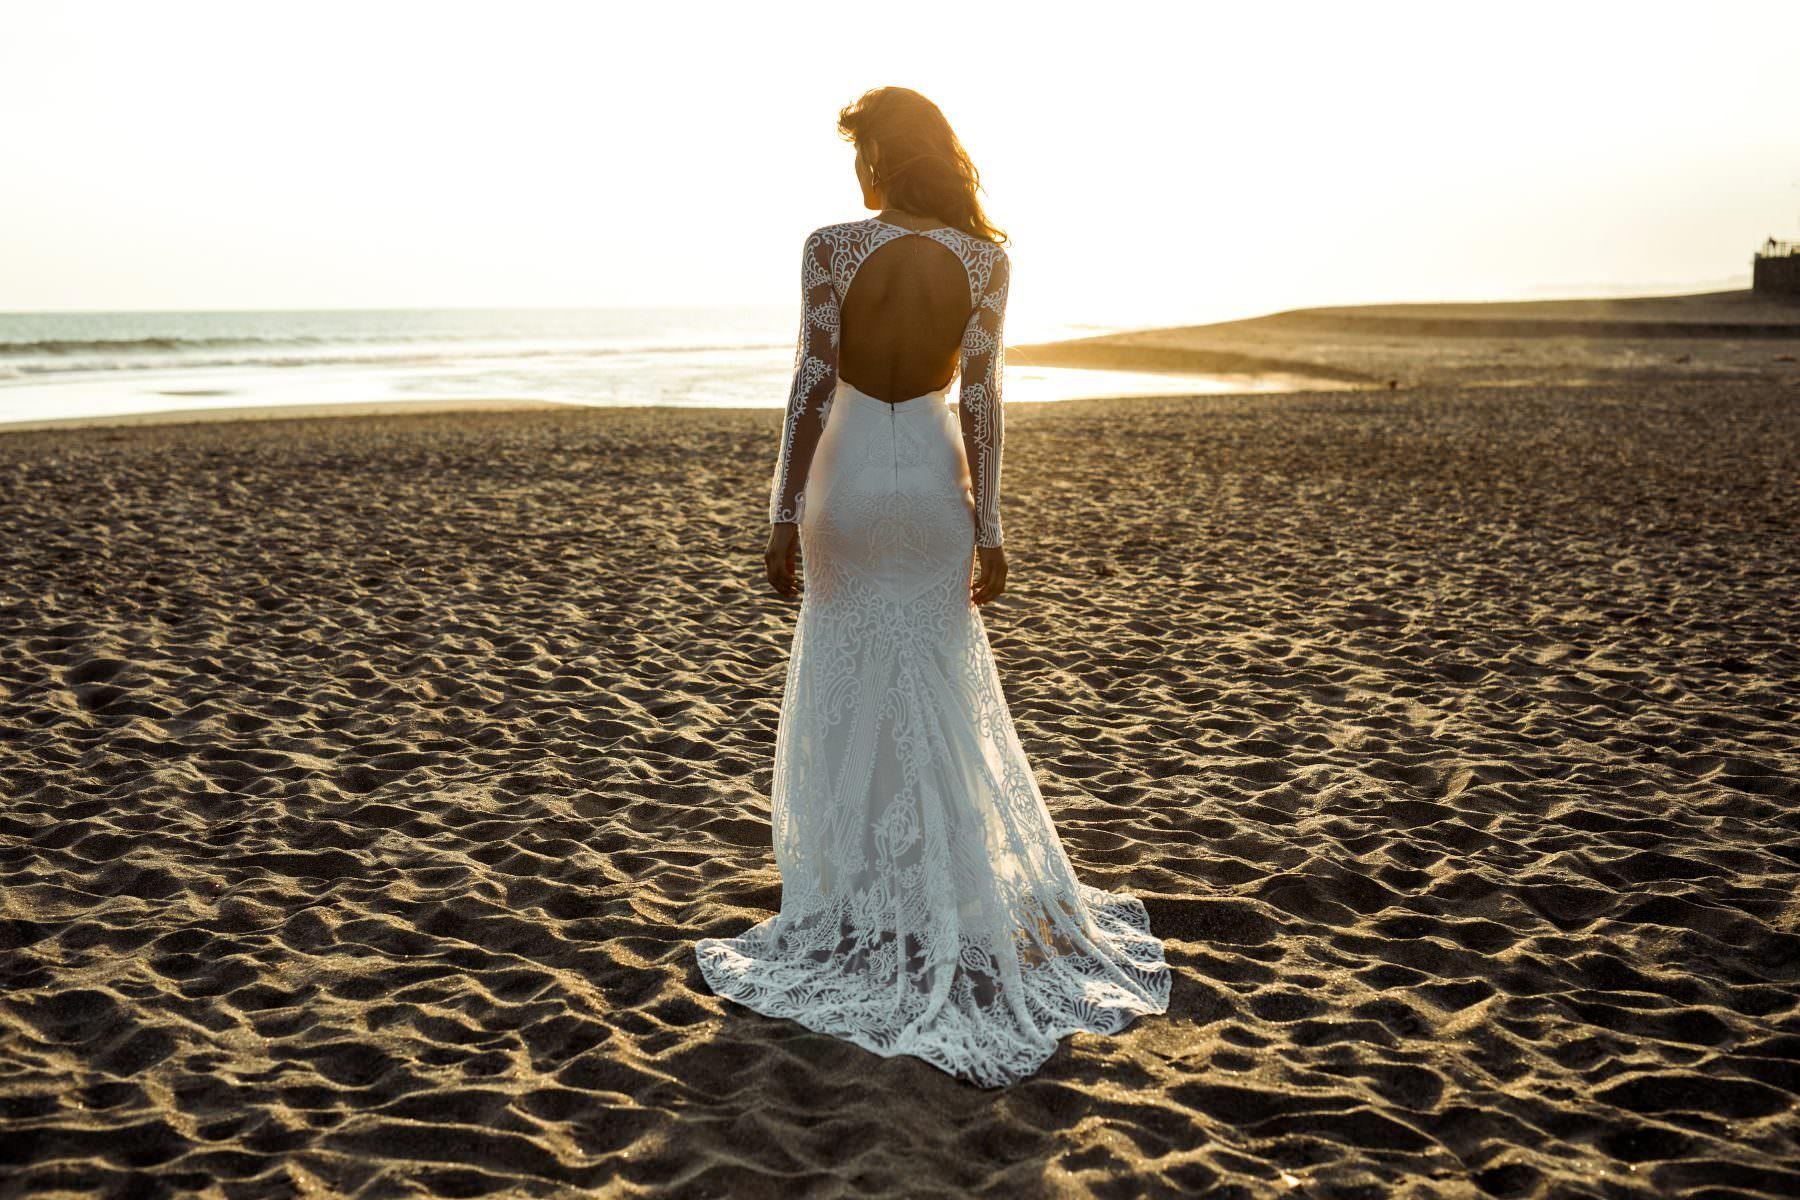 Tate lovers society wedding dresses Wedding Dress wedding dresses bridal shop store gowns christchurch wellington